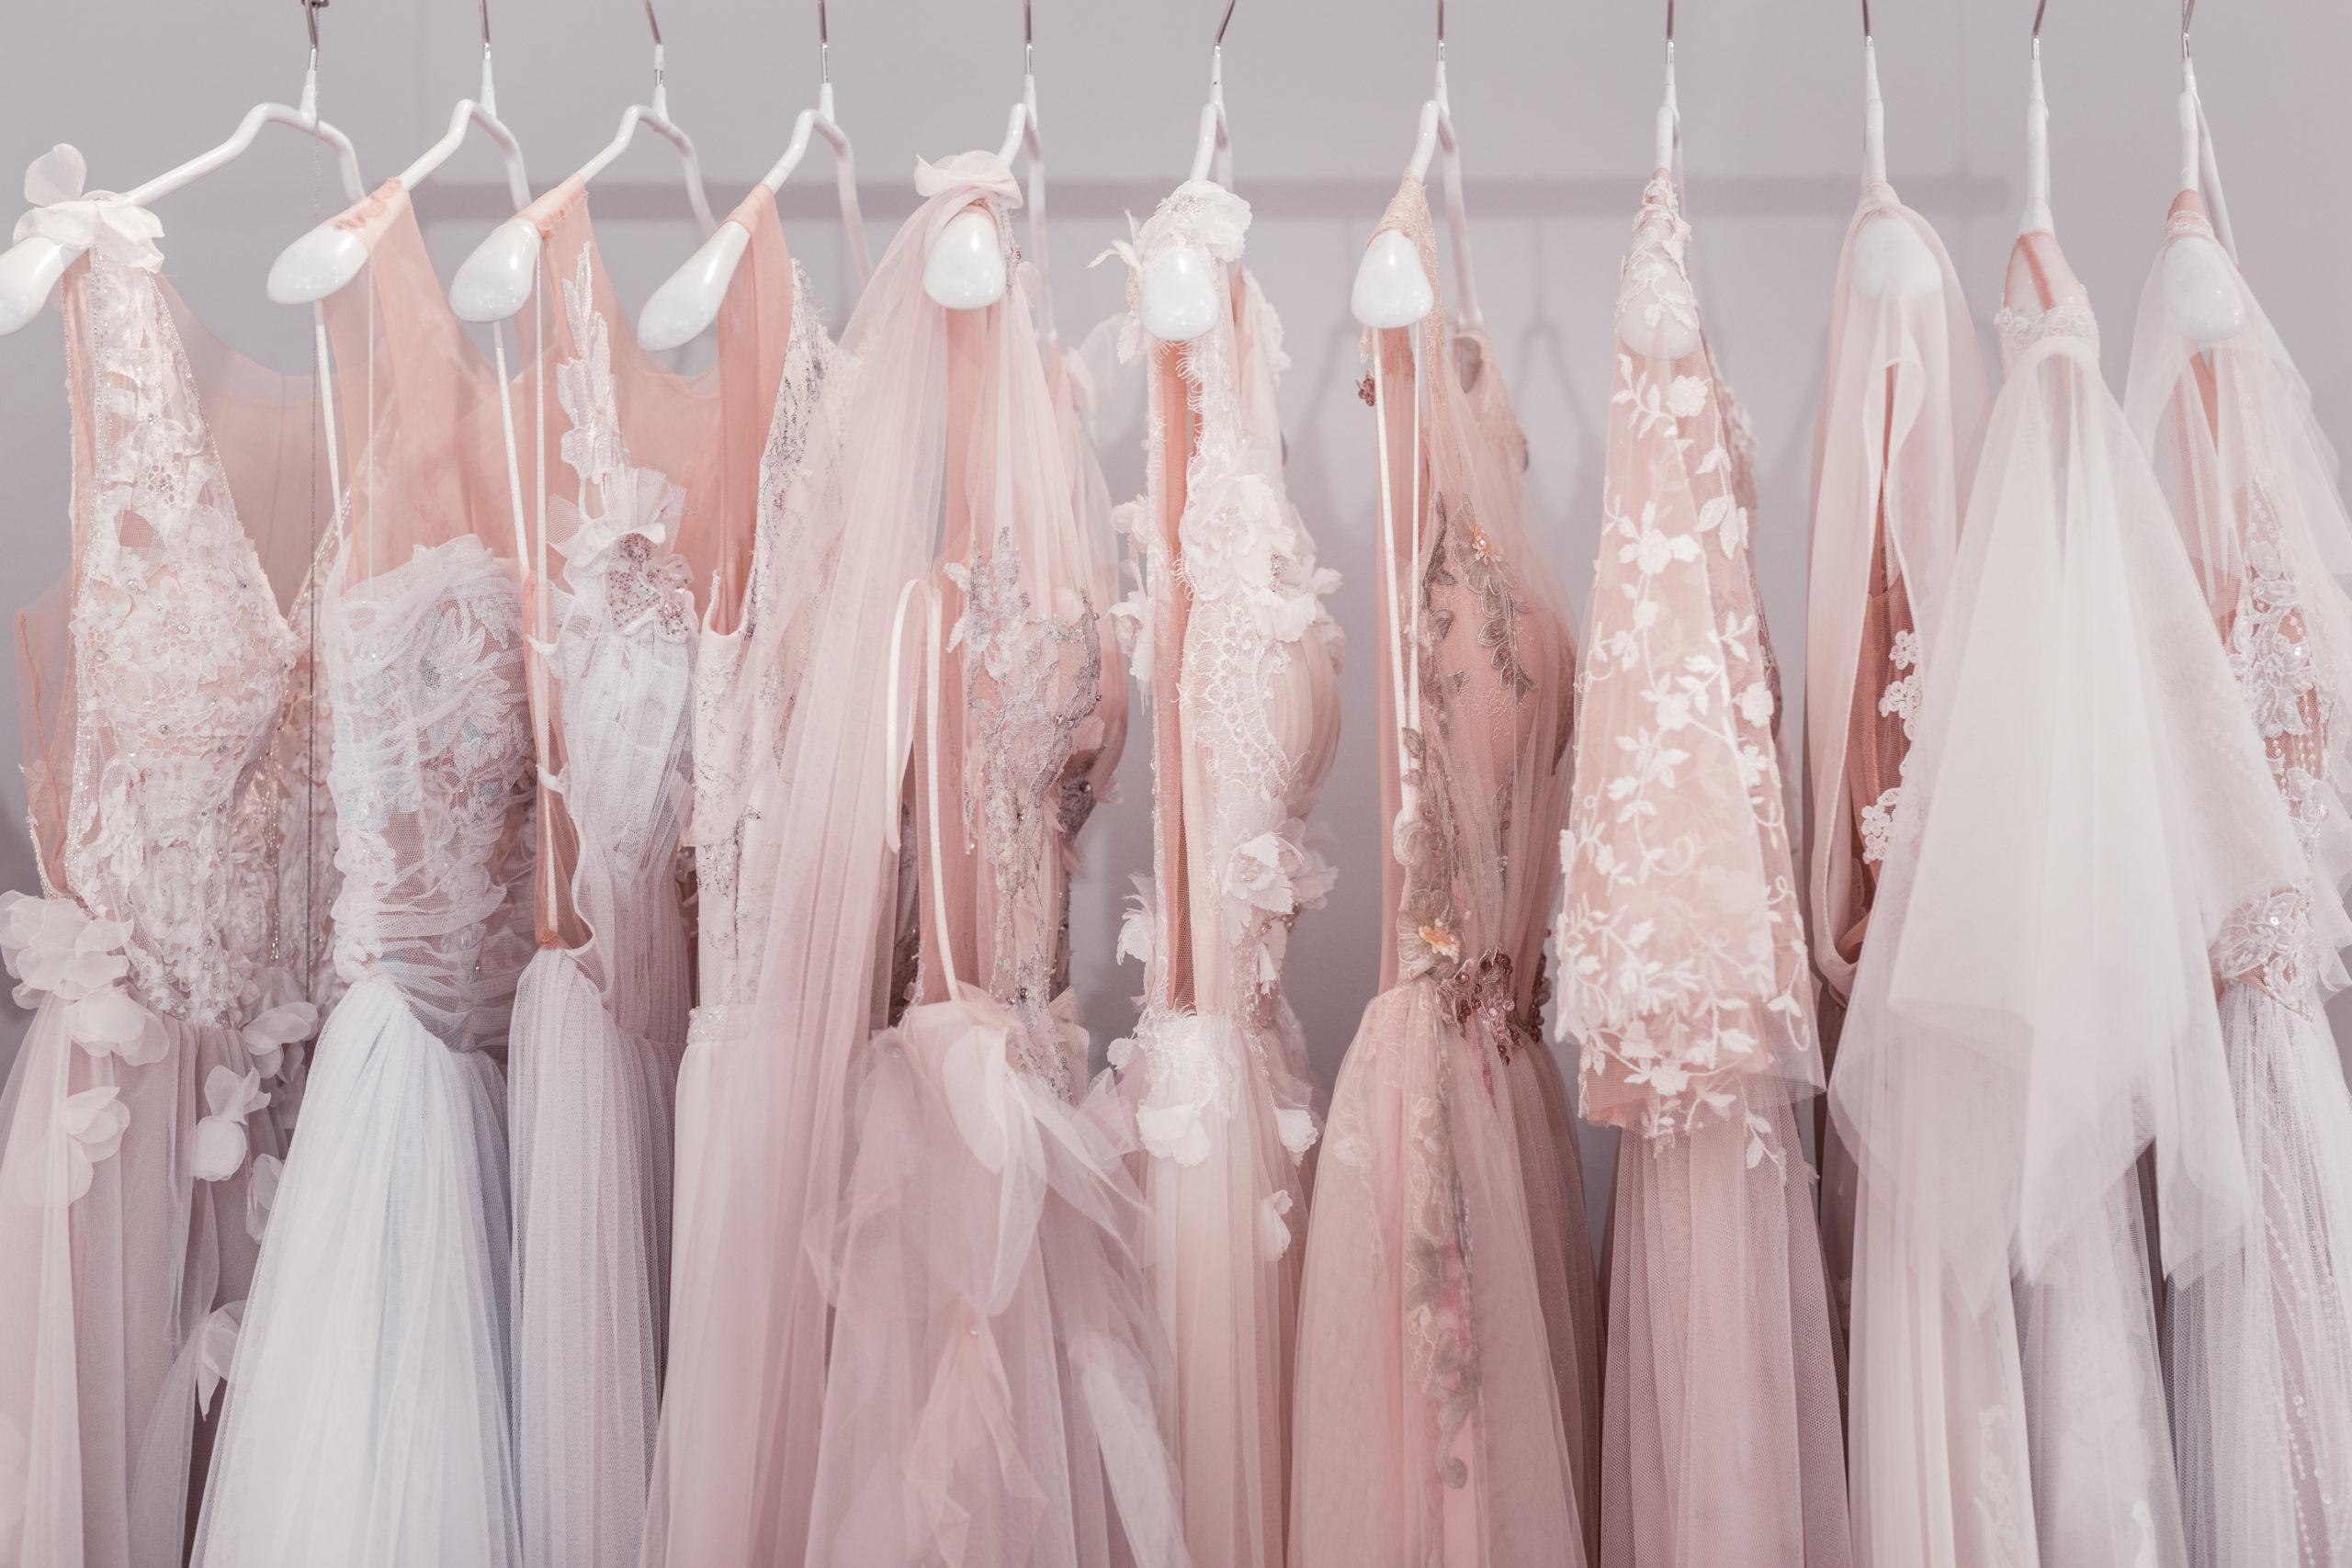 Dresses Hanging Up On Rail